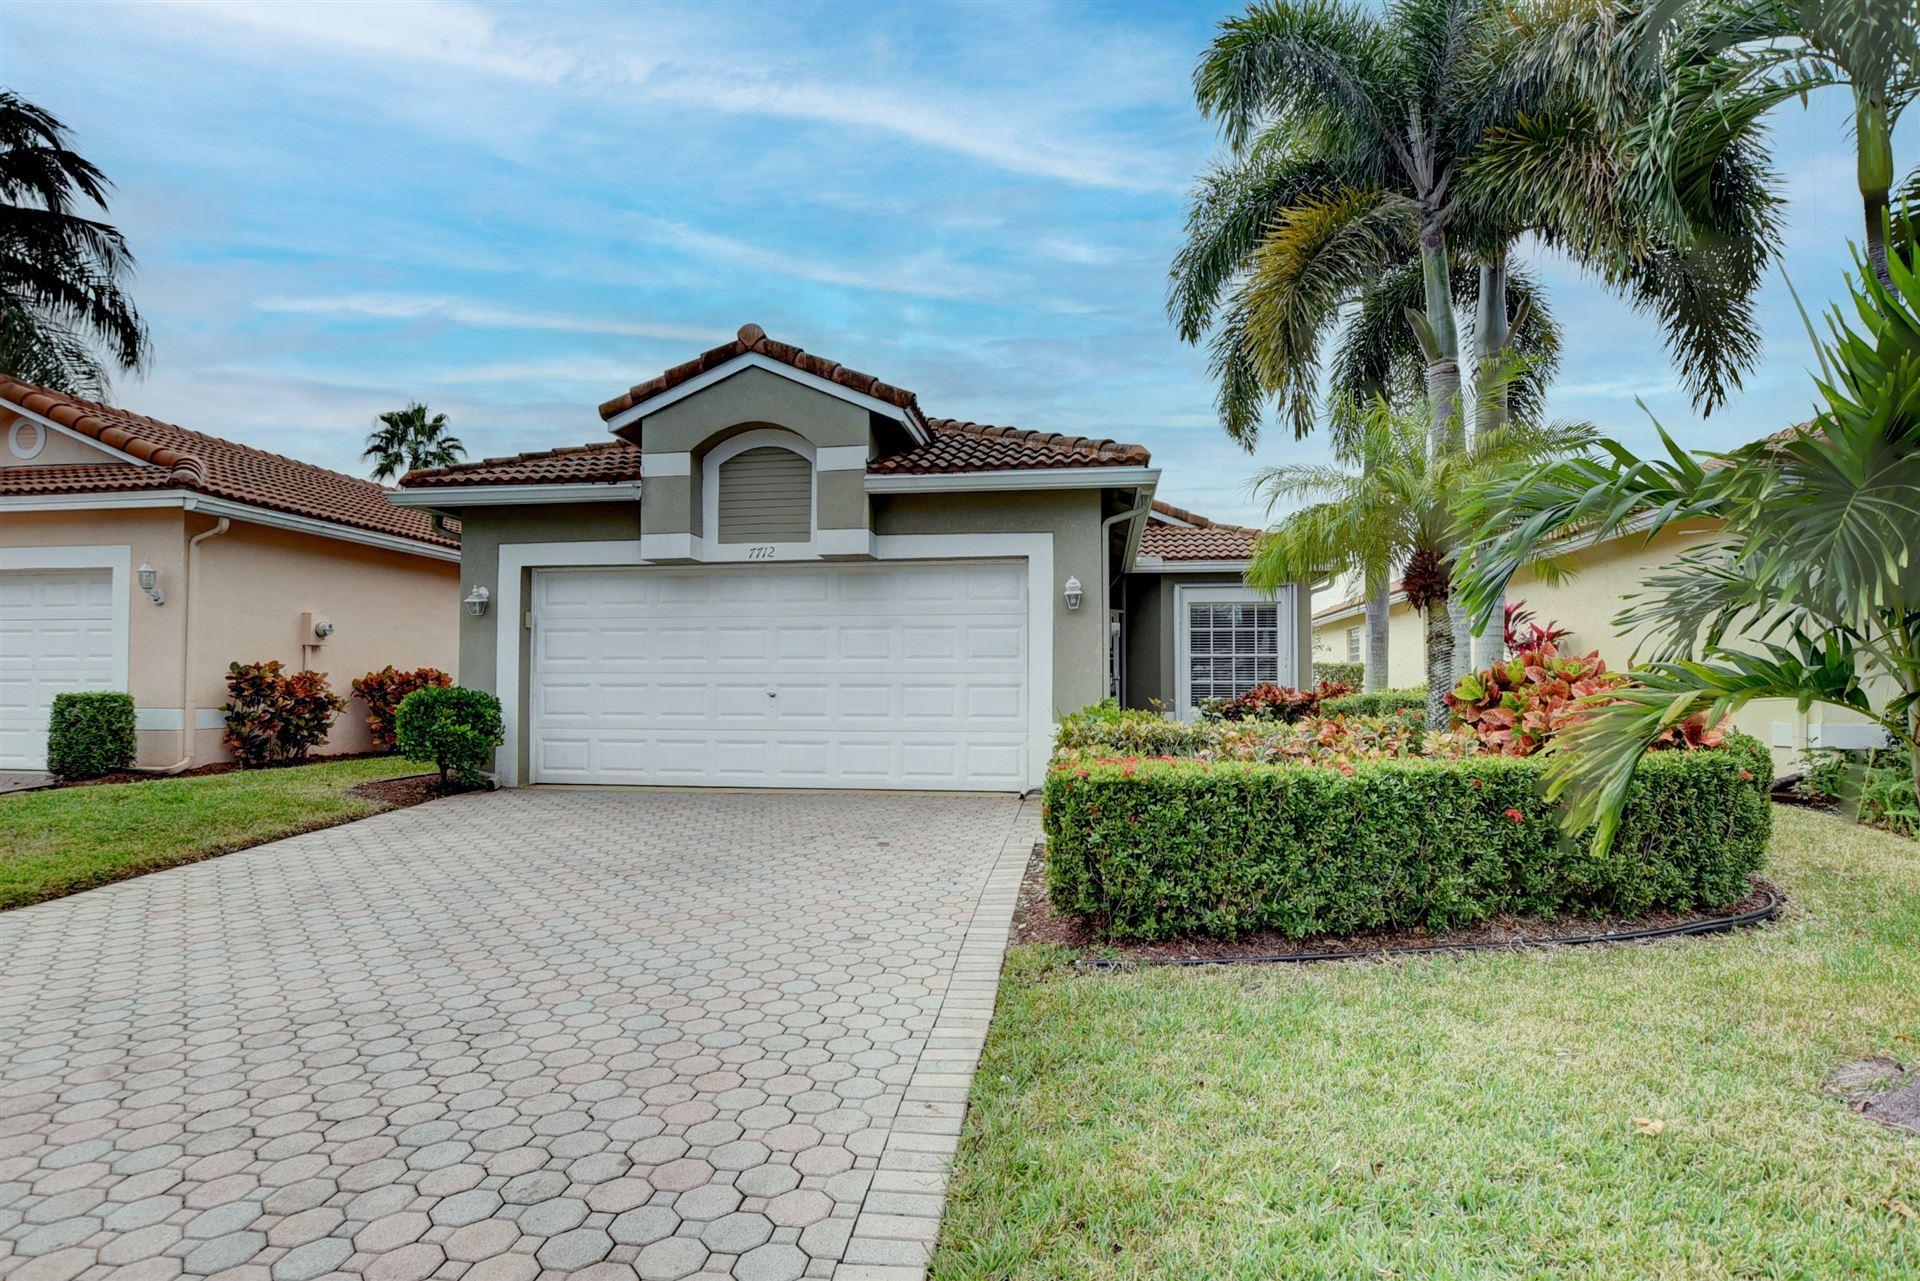 Photo of 7712 Cherry Blossom Street N, Boynton Beach, FL 33437 (MLS # RX-10682164)